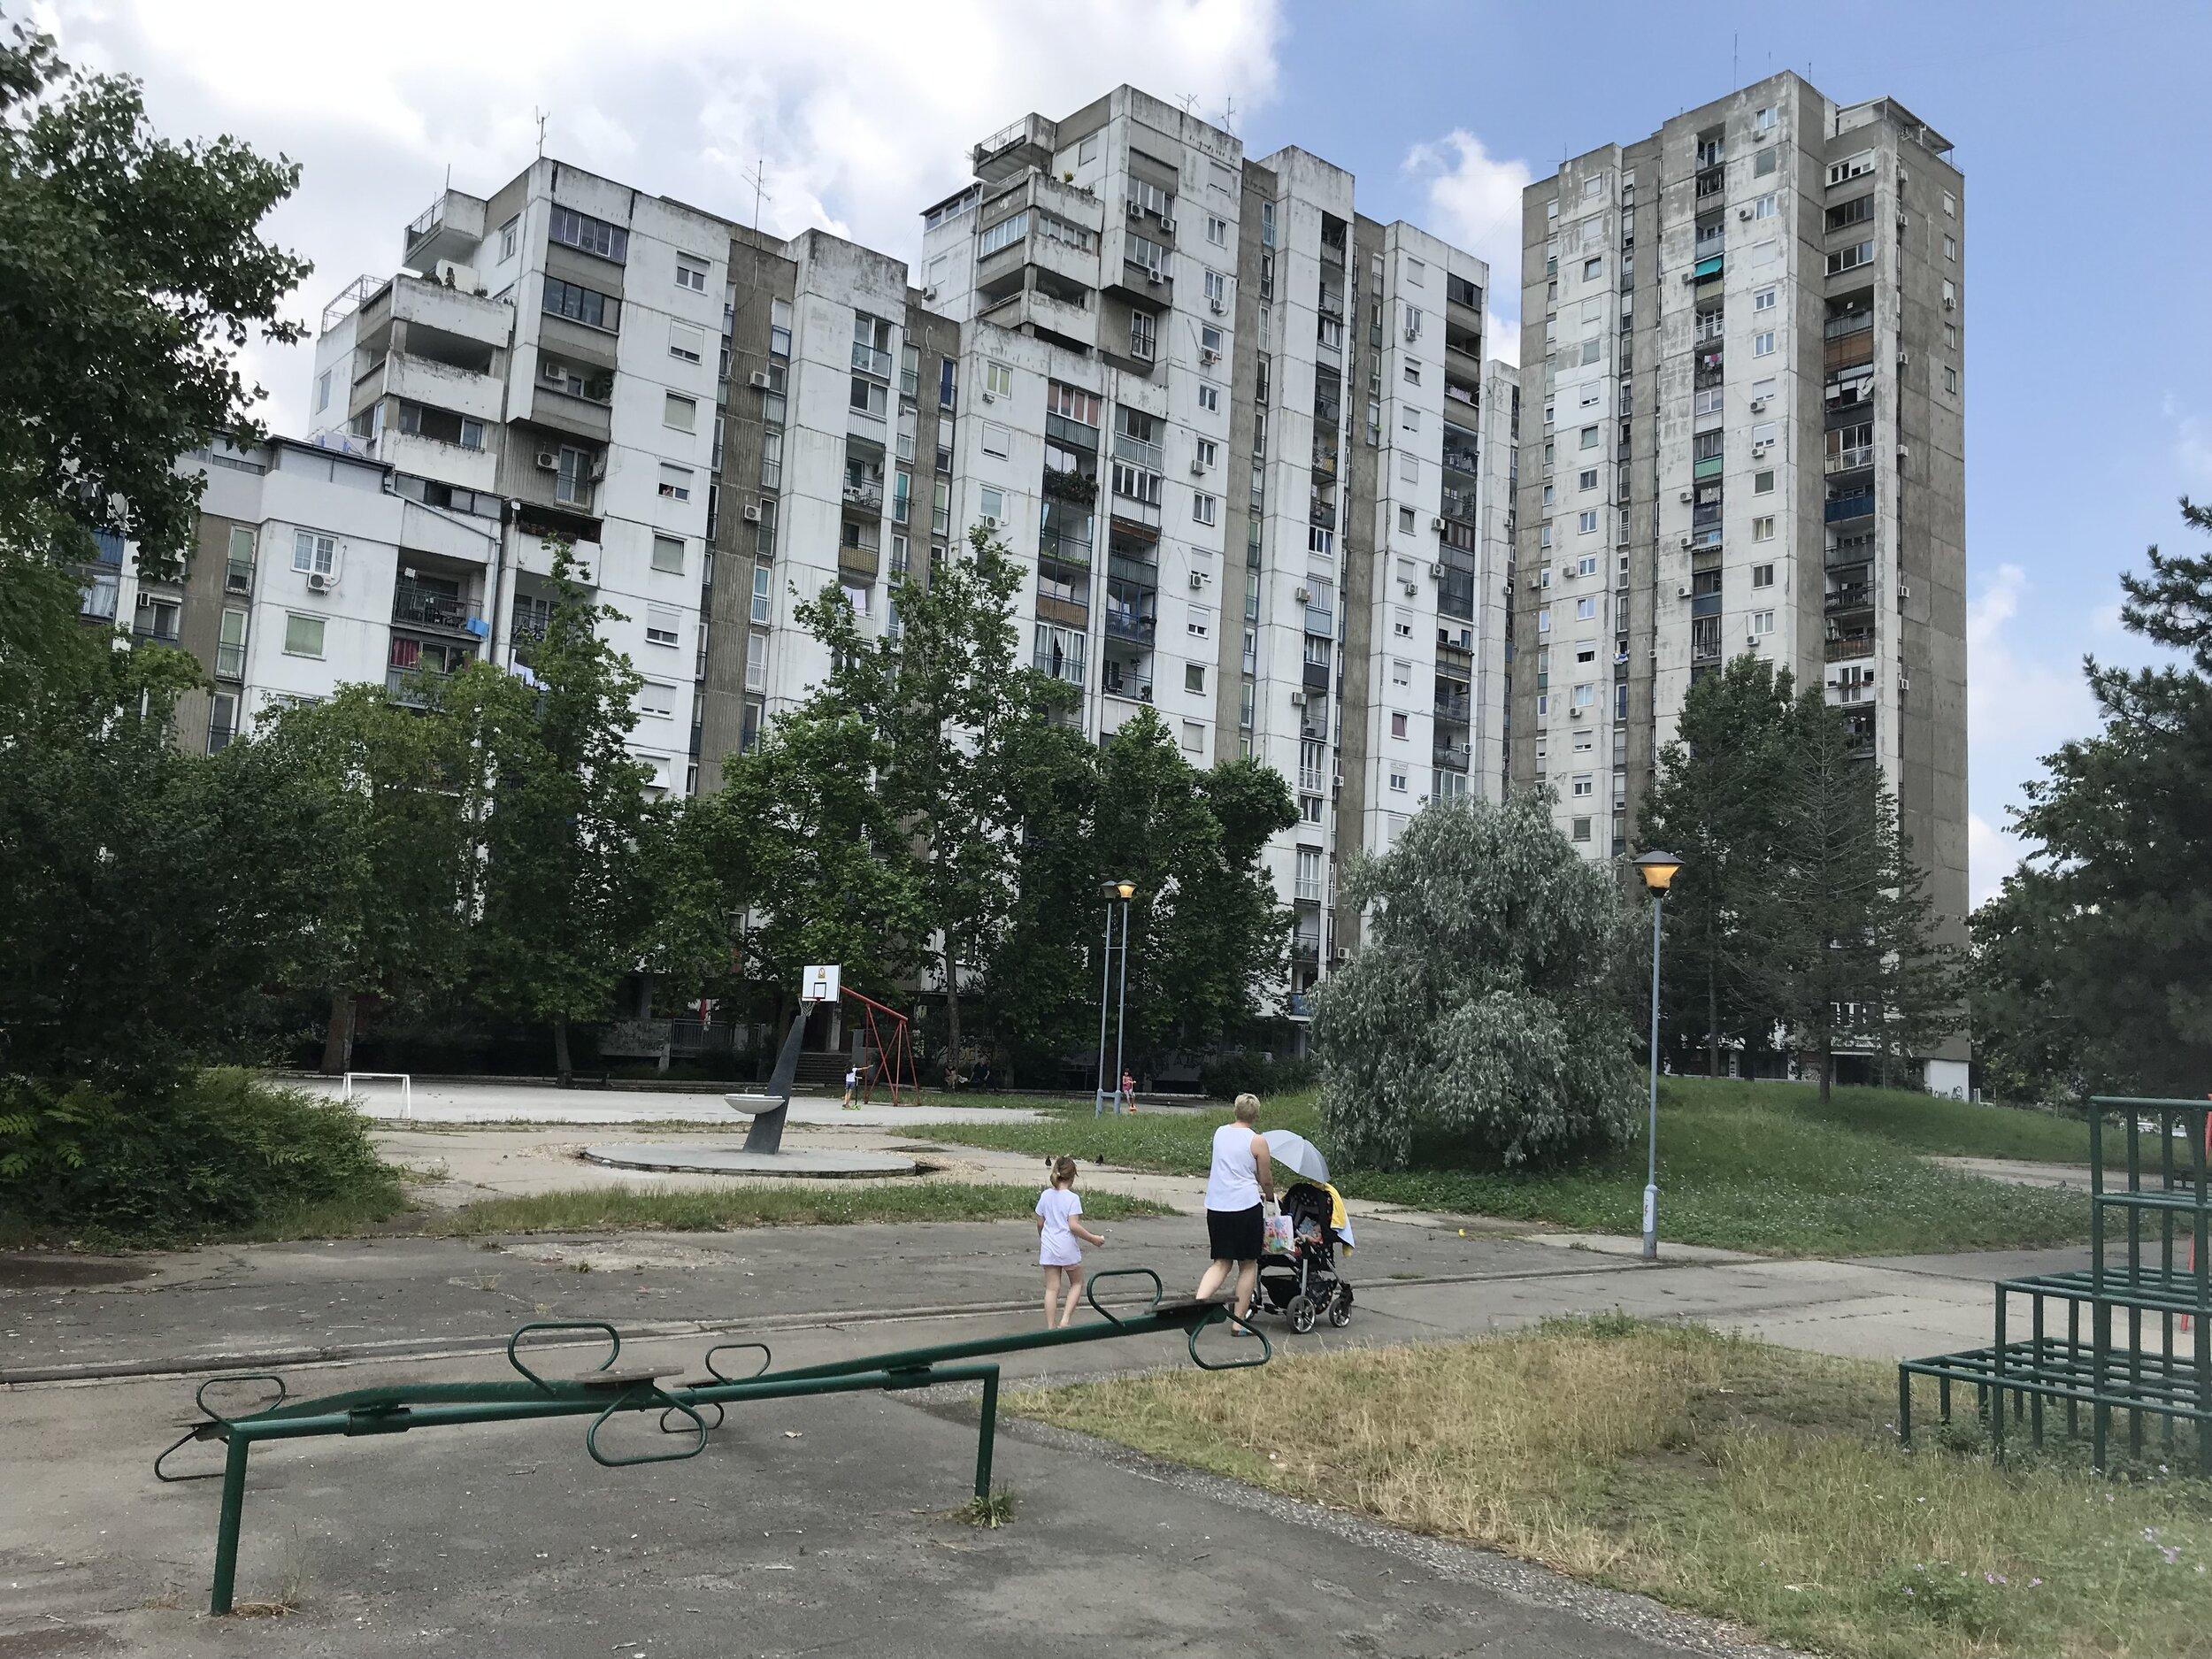 Figure 6. Bežanijski_01: View across lawn between towers in Bežanijski blokovi, Block 62, 2019. Photograph by Michael R. Allen.